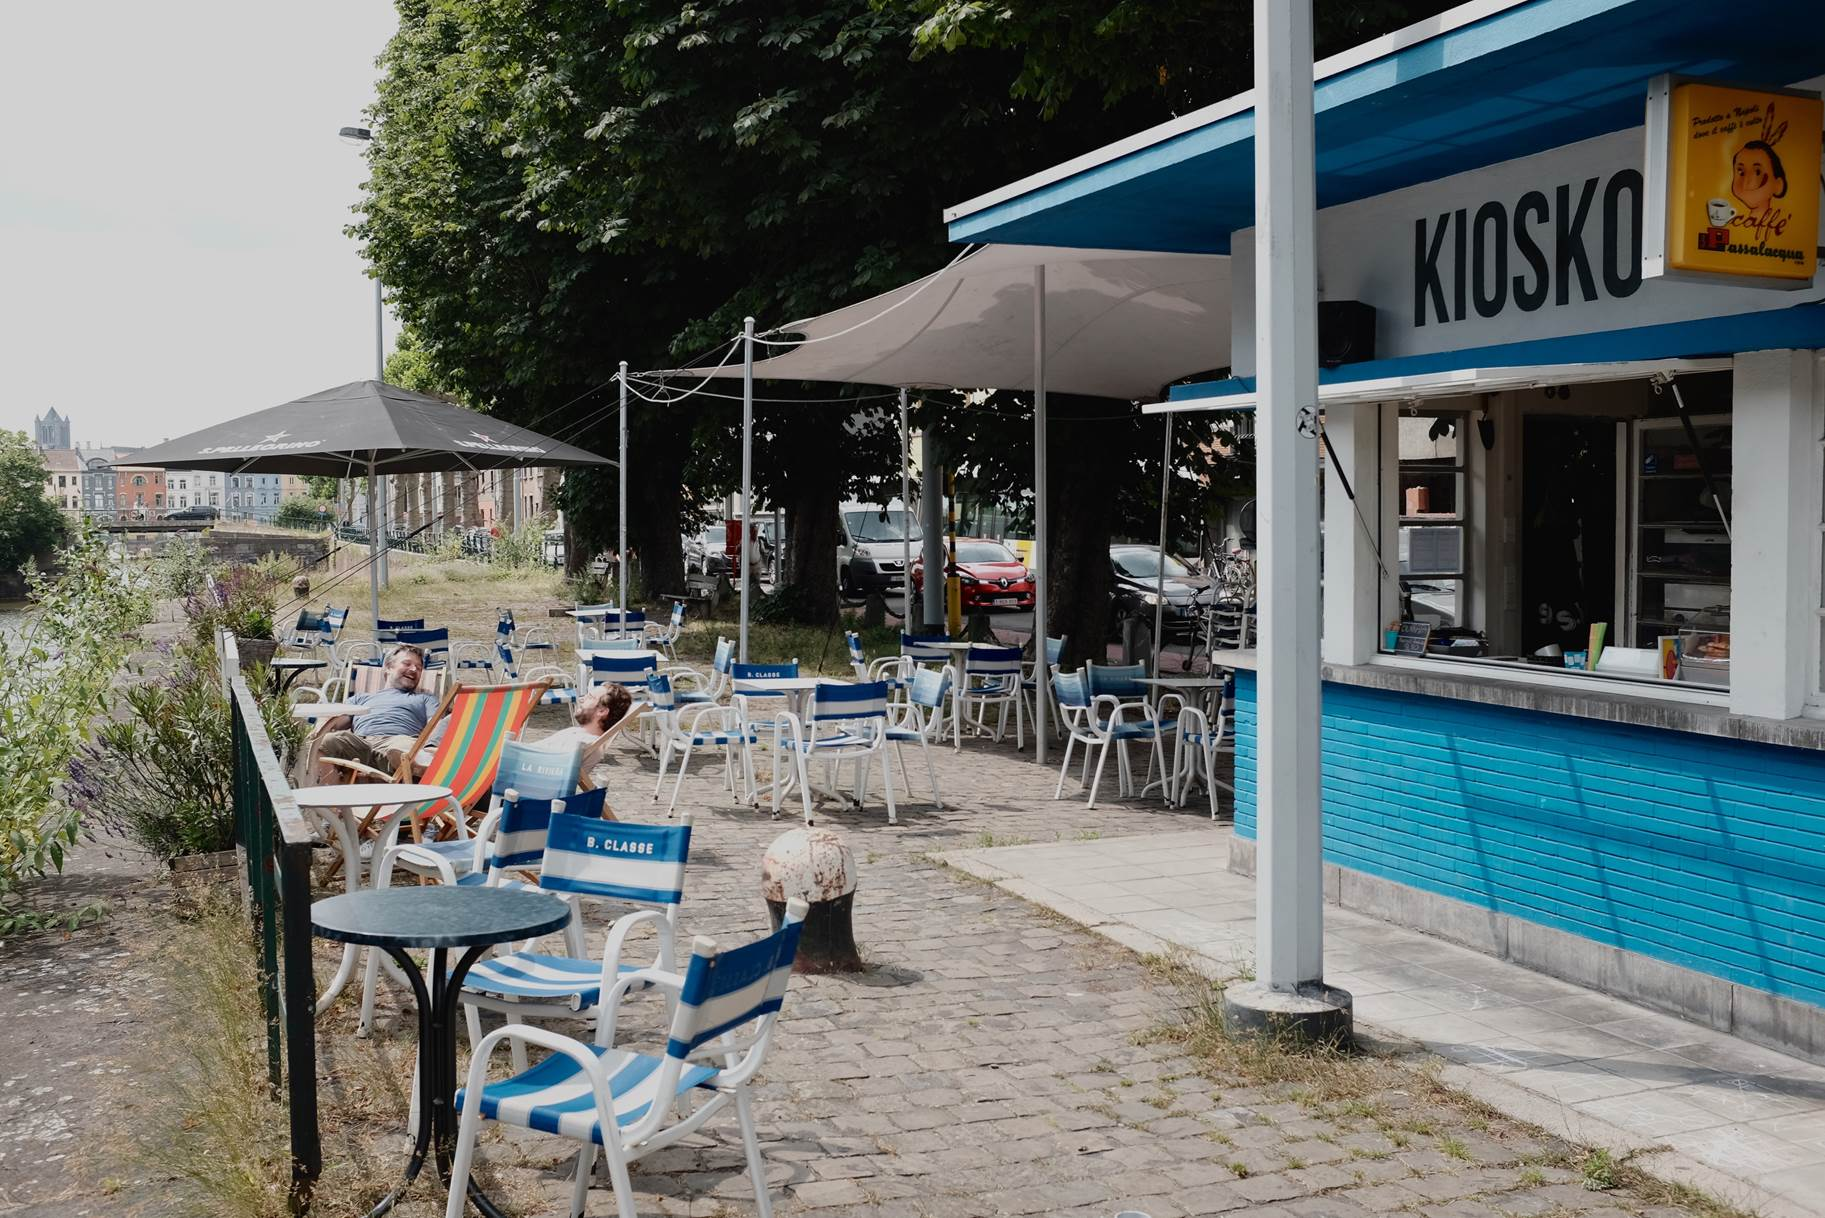 kiosko gent zomerbars